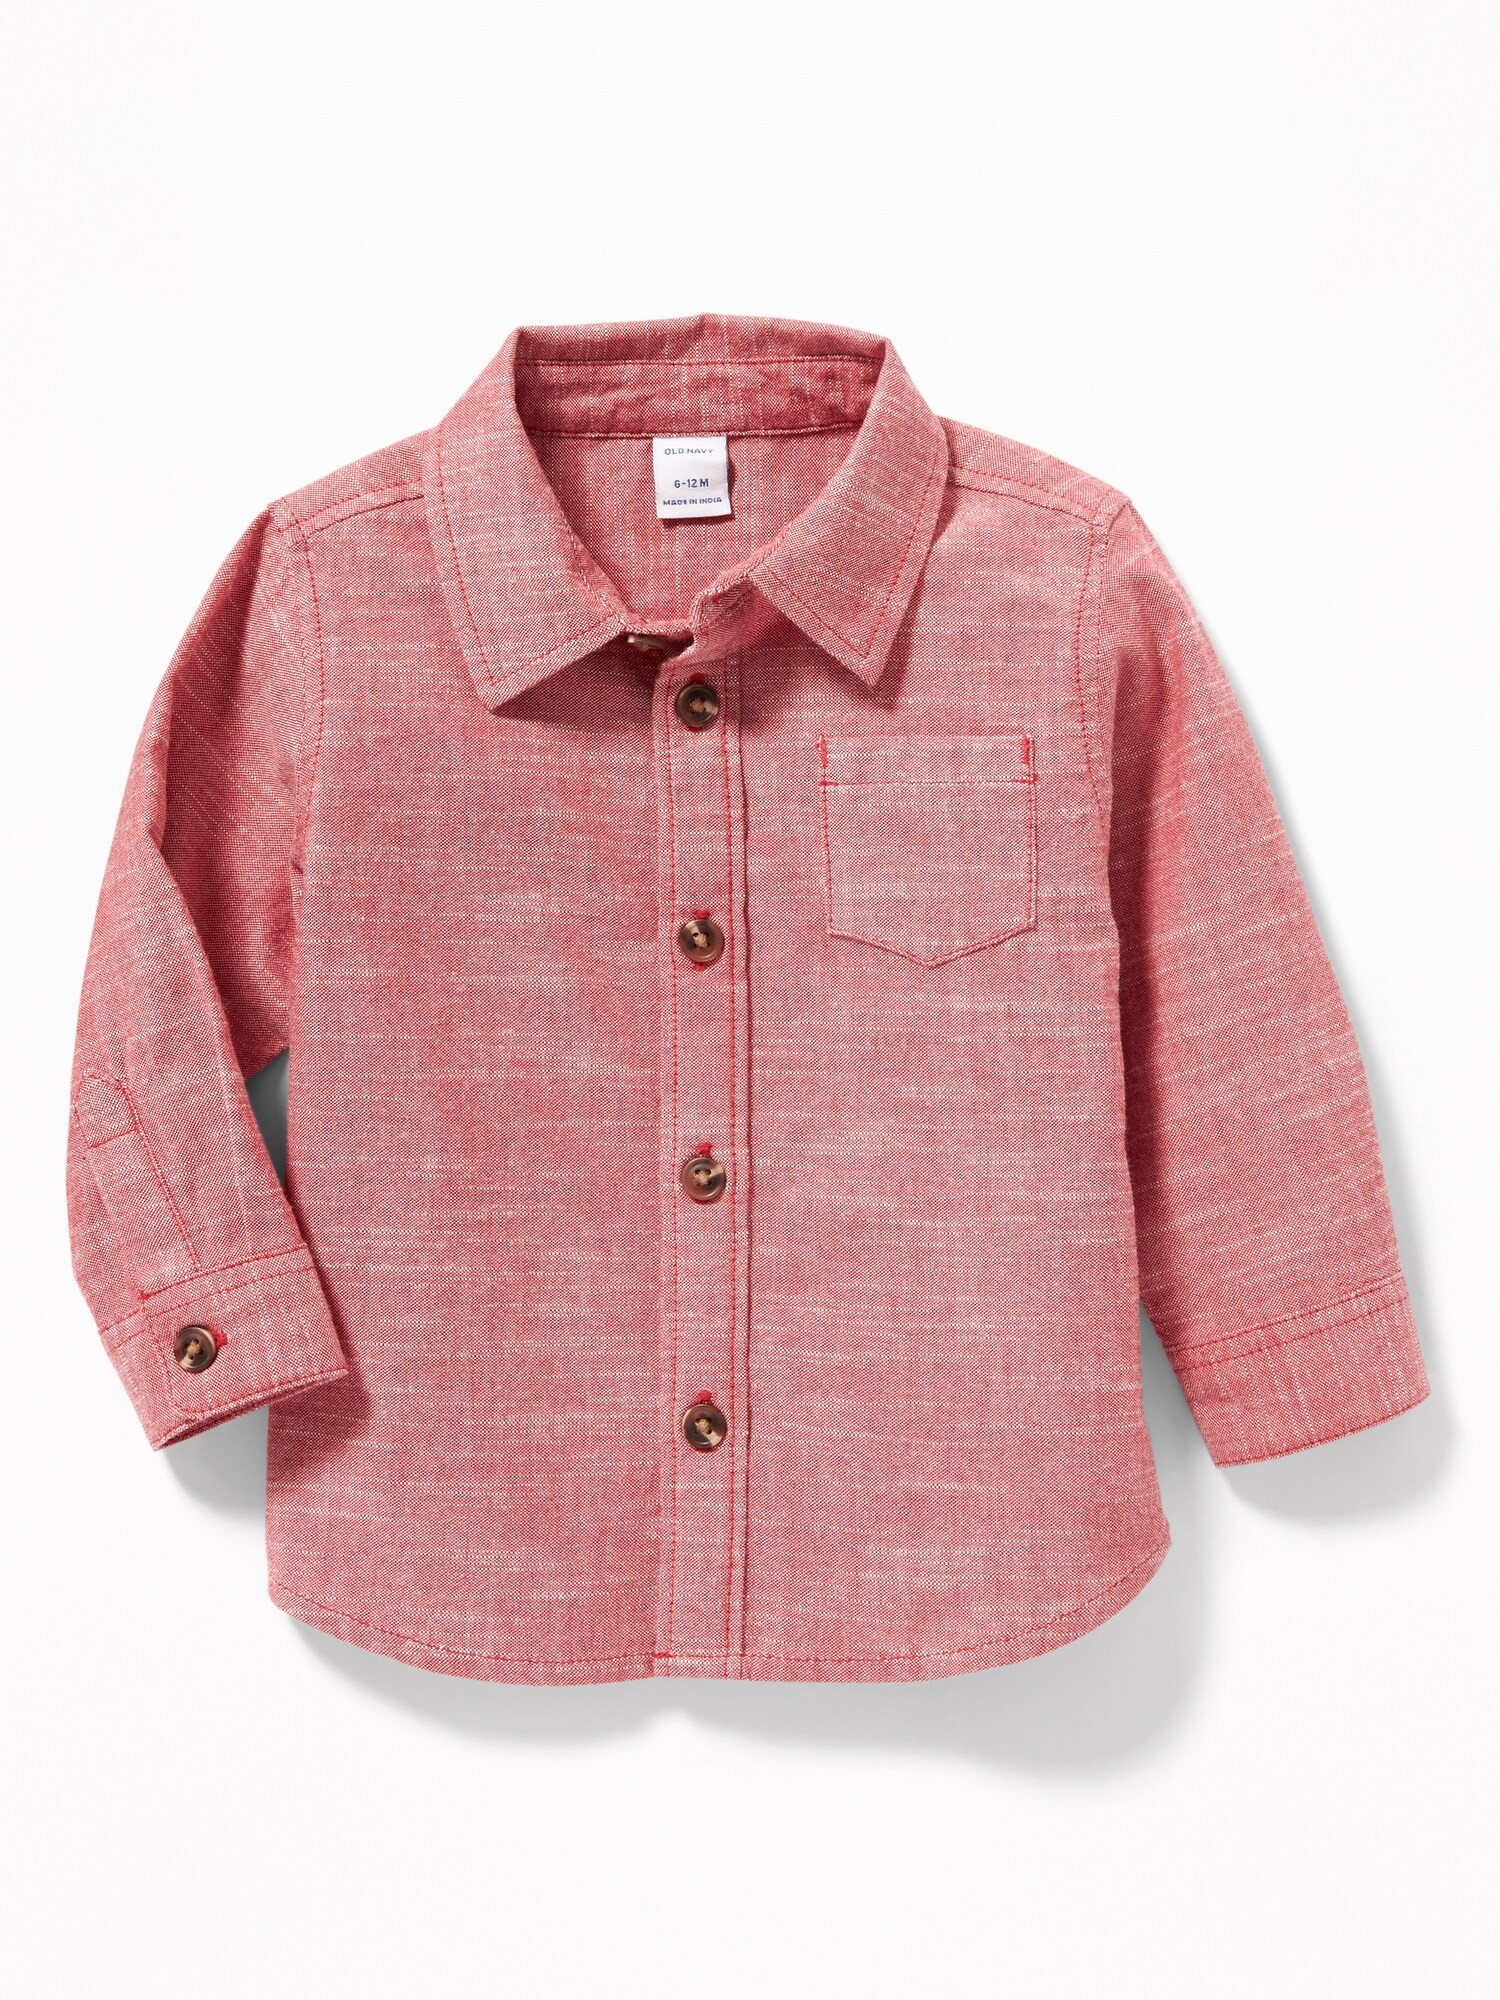 b98cc9977c7f7 Pocket Shirt for Baby